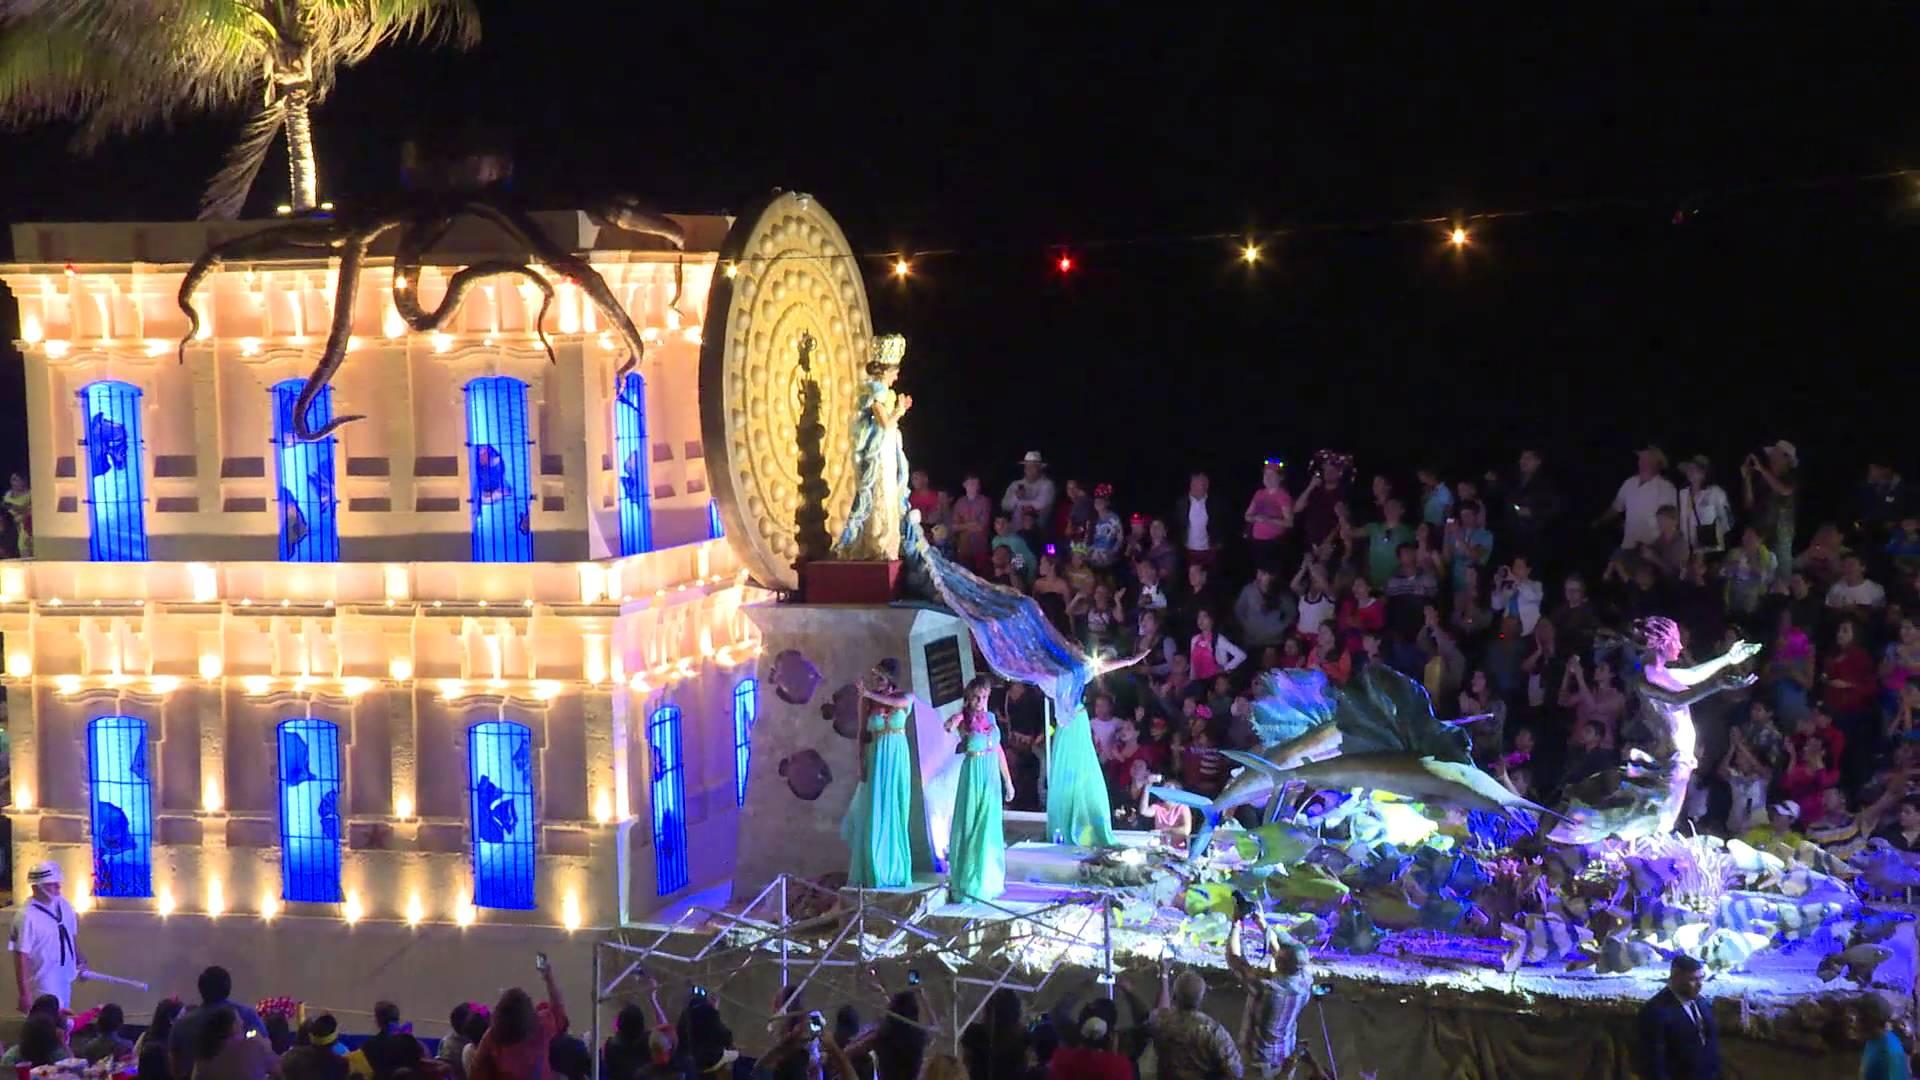 Mazatlan carnival 2016 (Photo: YouTube)